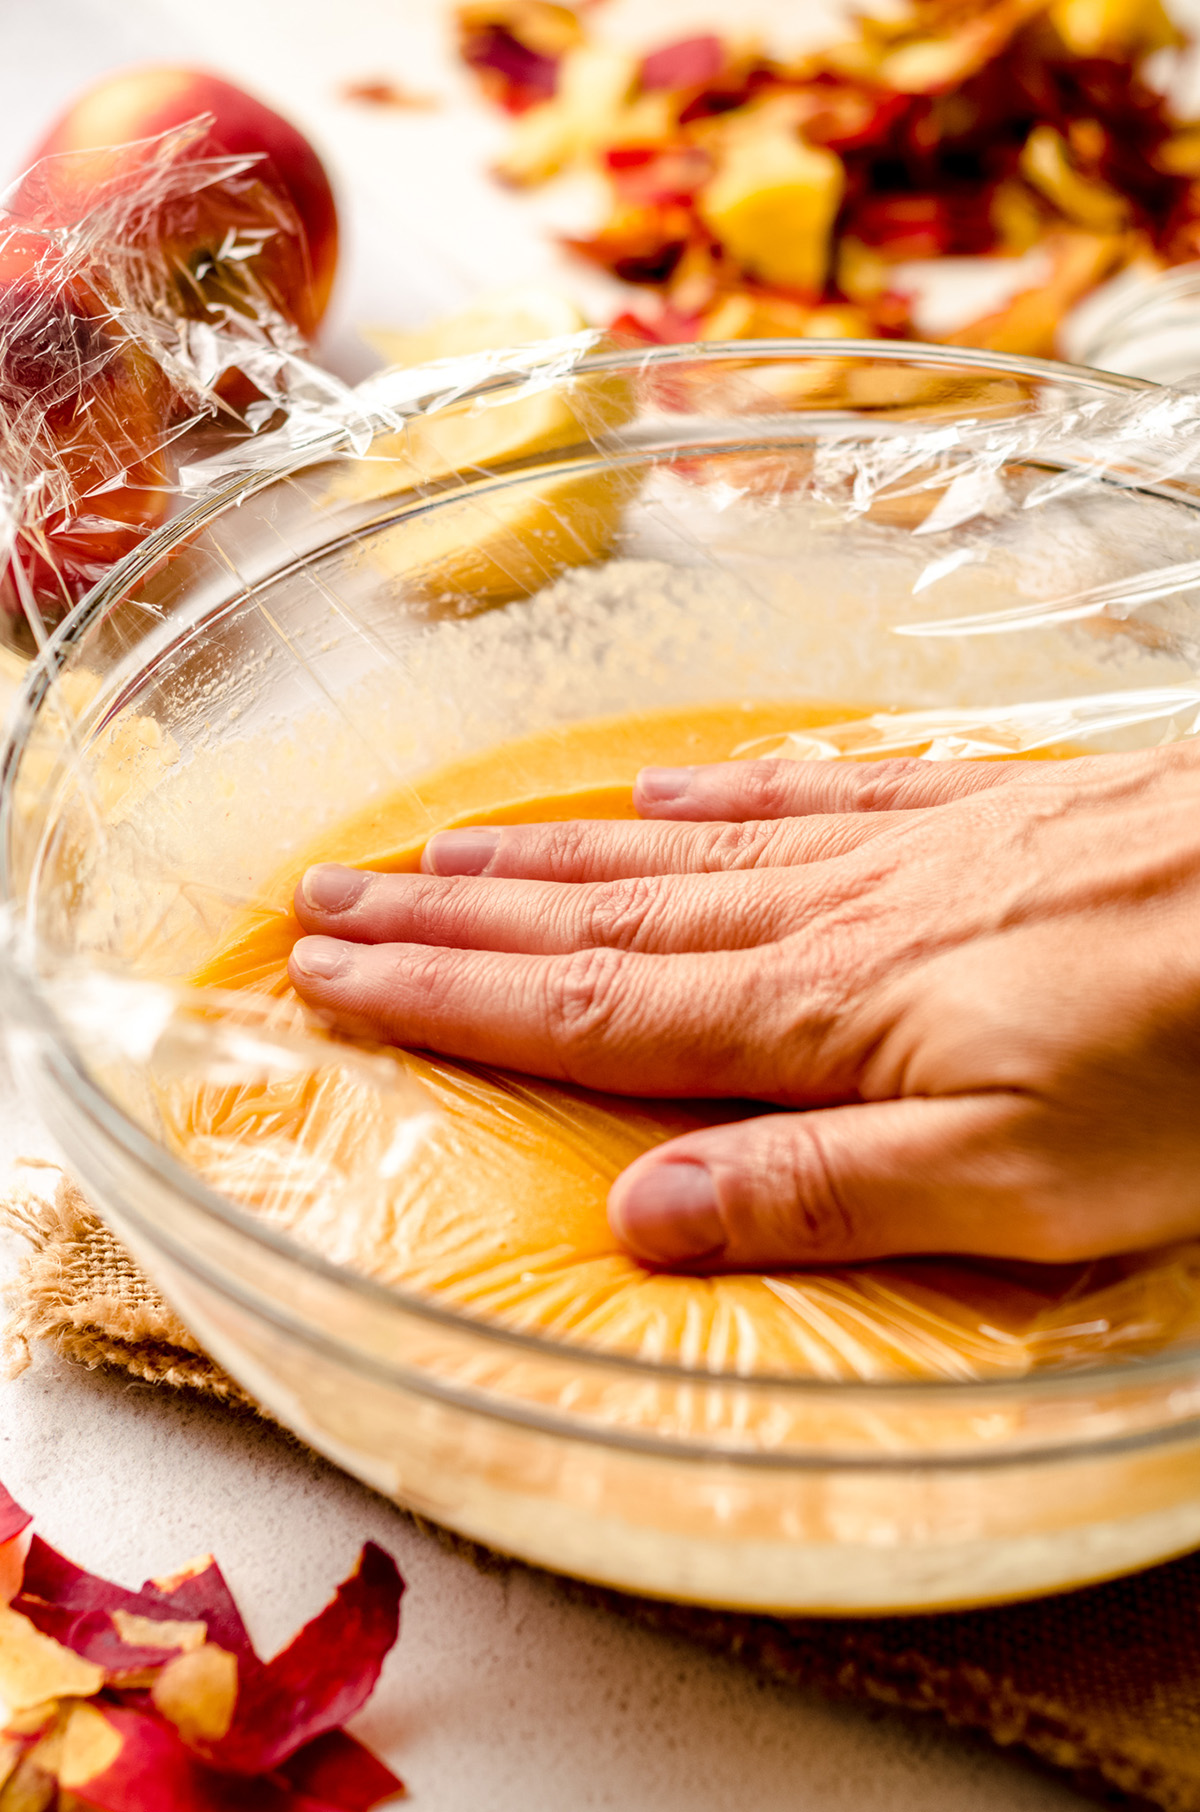 hand pressing plastic wrap onto peach curd